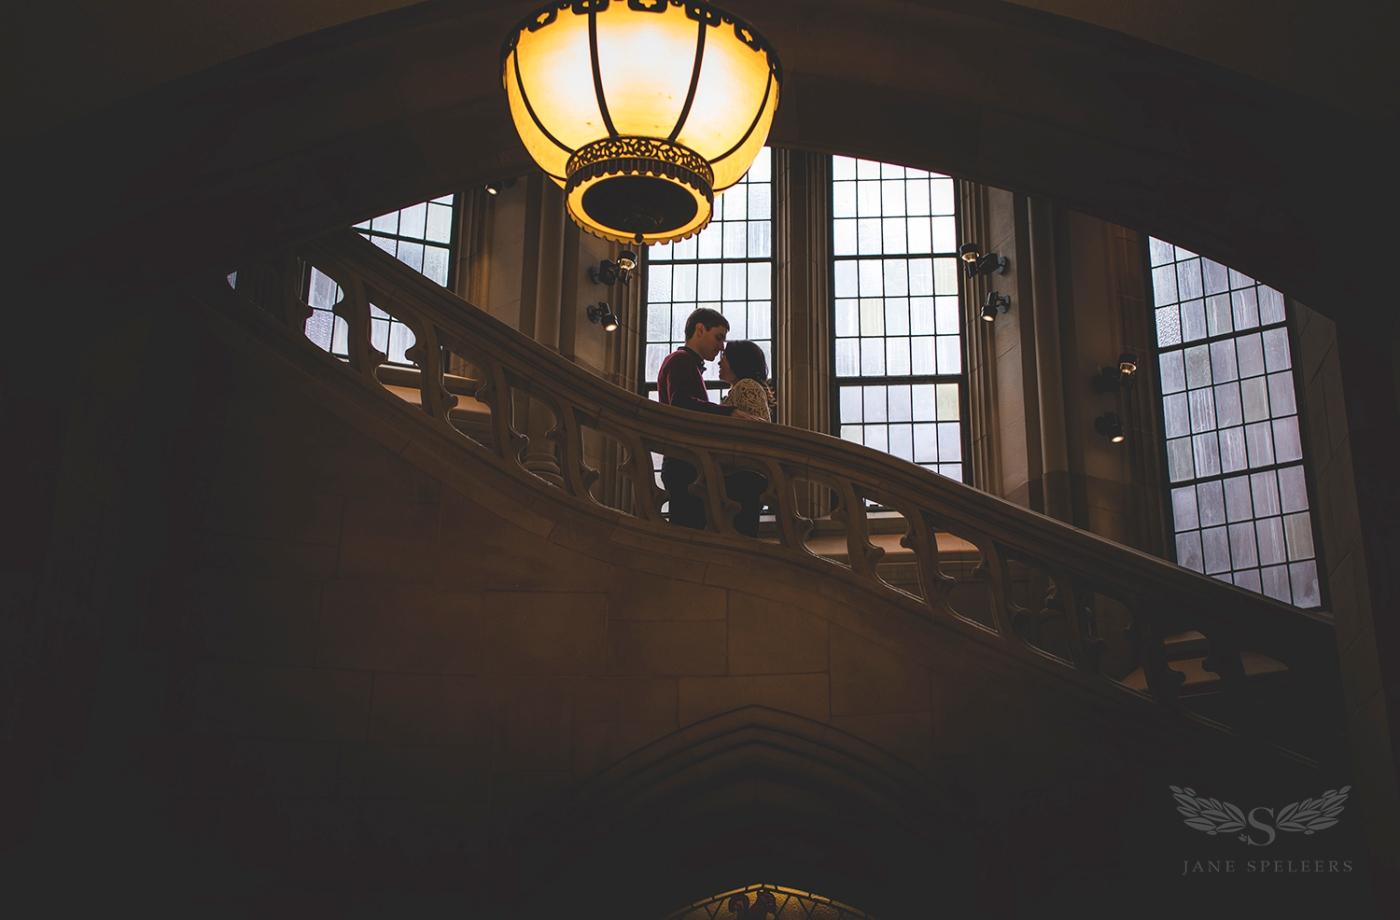 Engagement-UW-Lawcampus_Rebecca_and_Evan DSC_5631